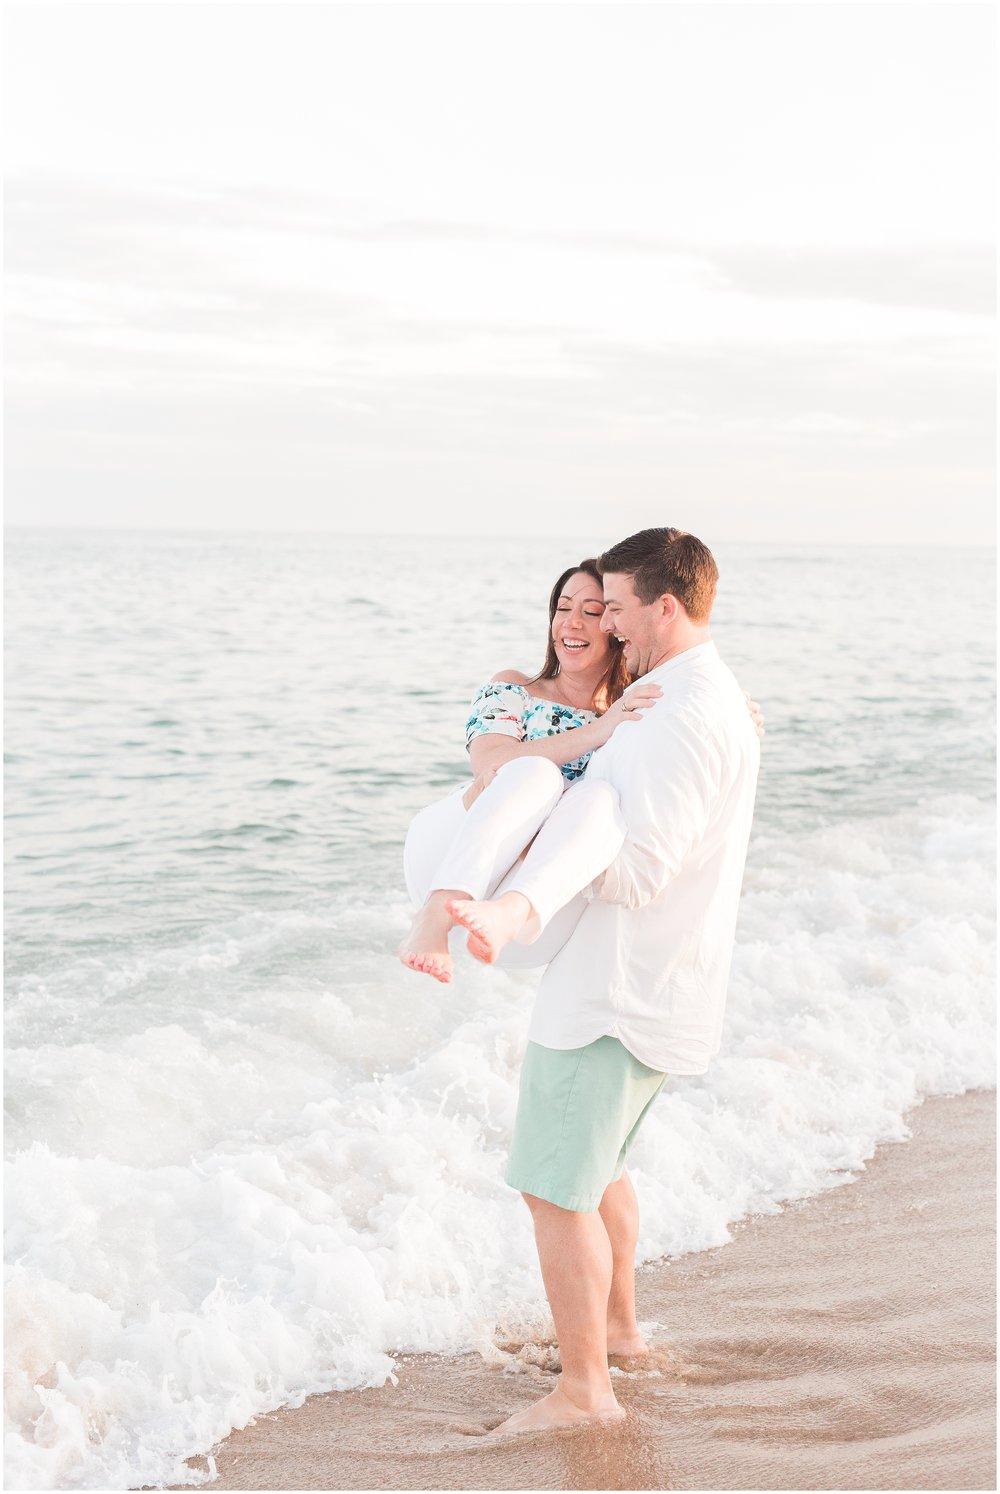 Southampton-The-Hamptons-New-York-Beach-Summer-Engagement-Photo-_0075.jpg